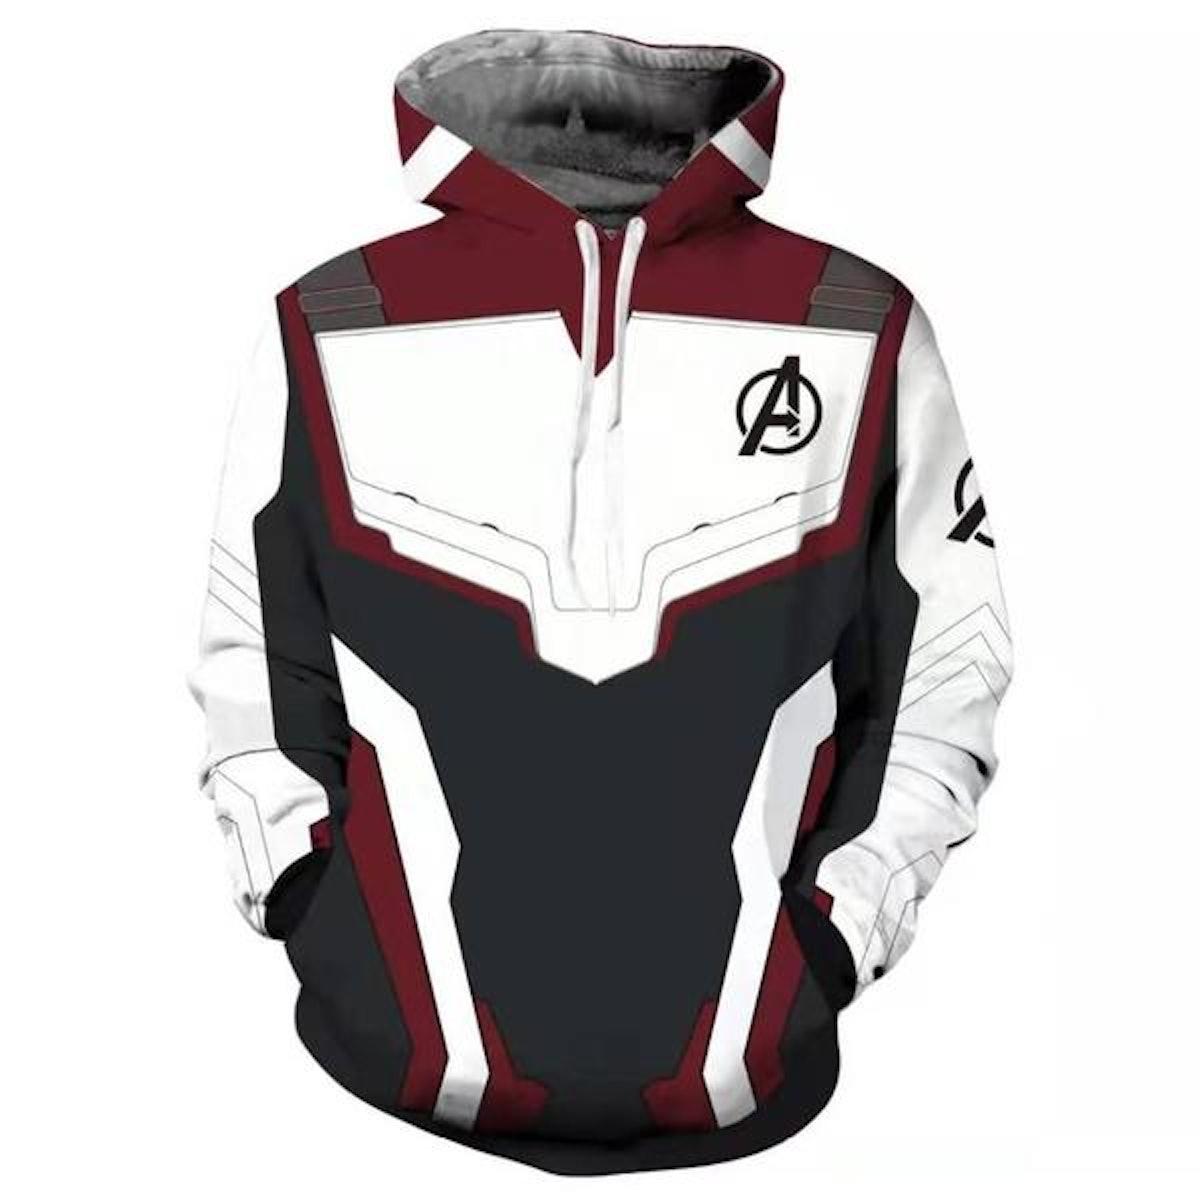 Avengers Endgame 4 Quantum Realm Hooded Sweatshirt